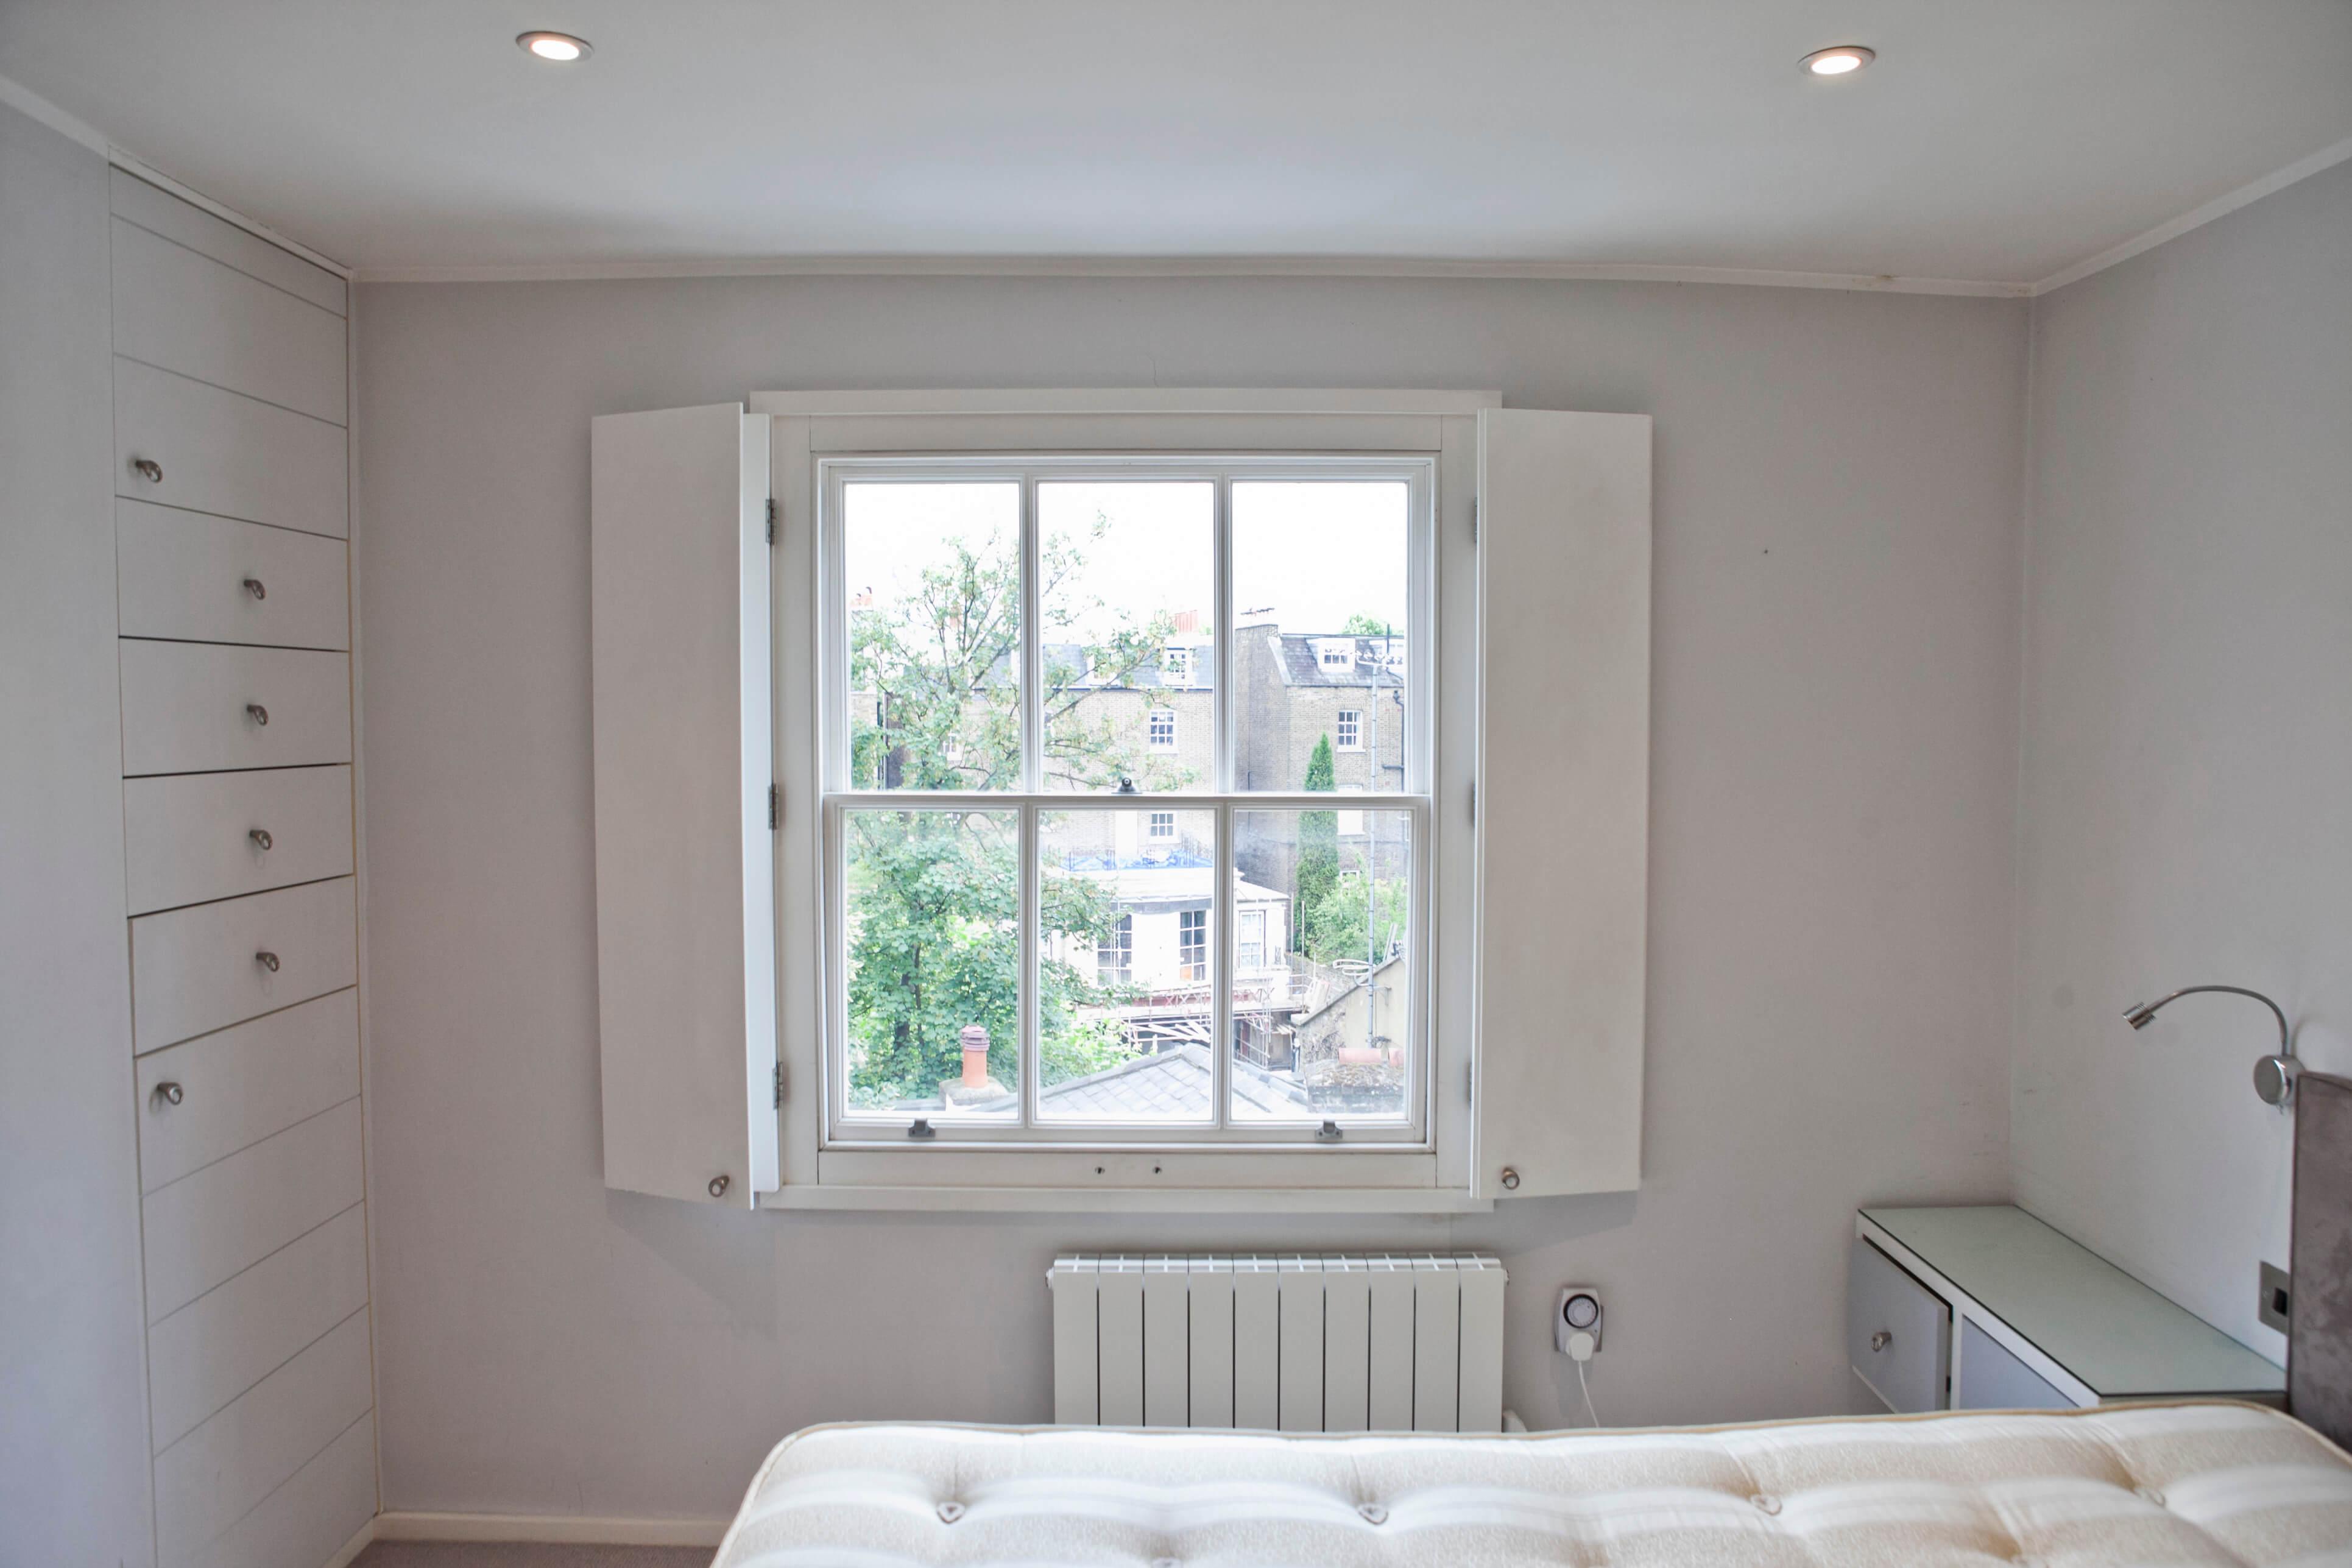 IMG 31271 - Property Listings